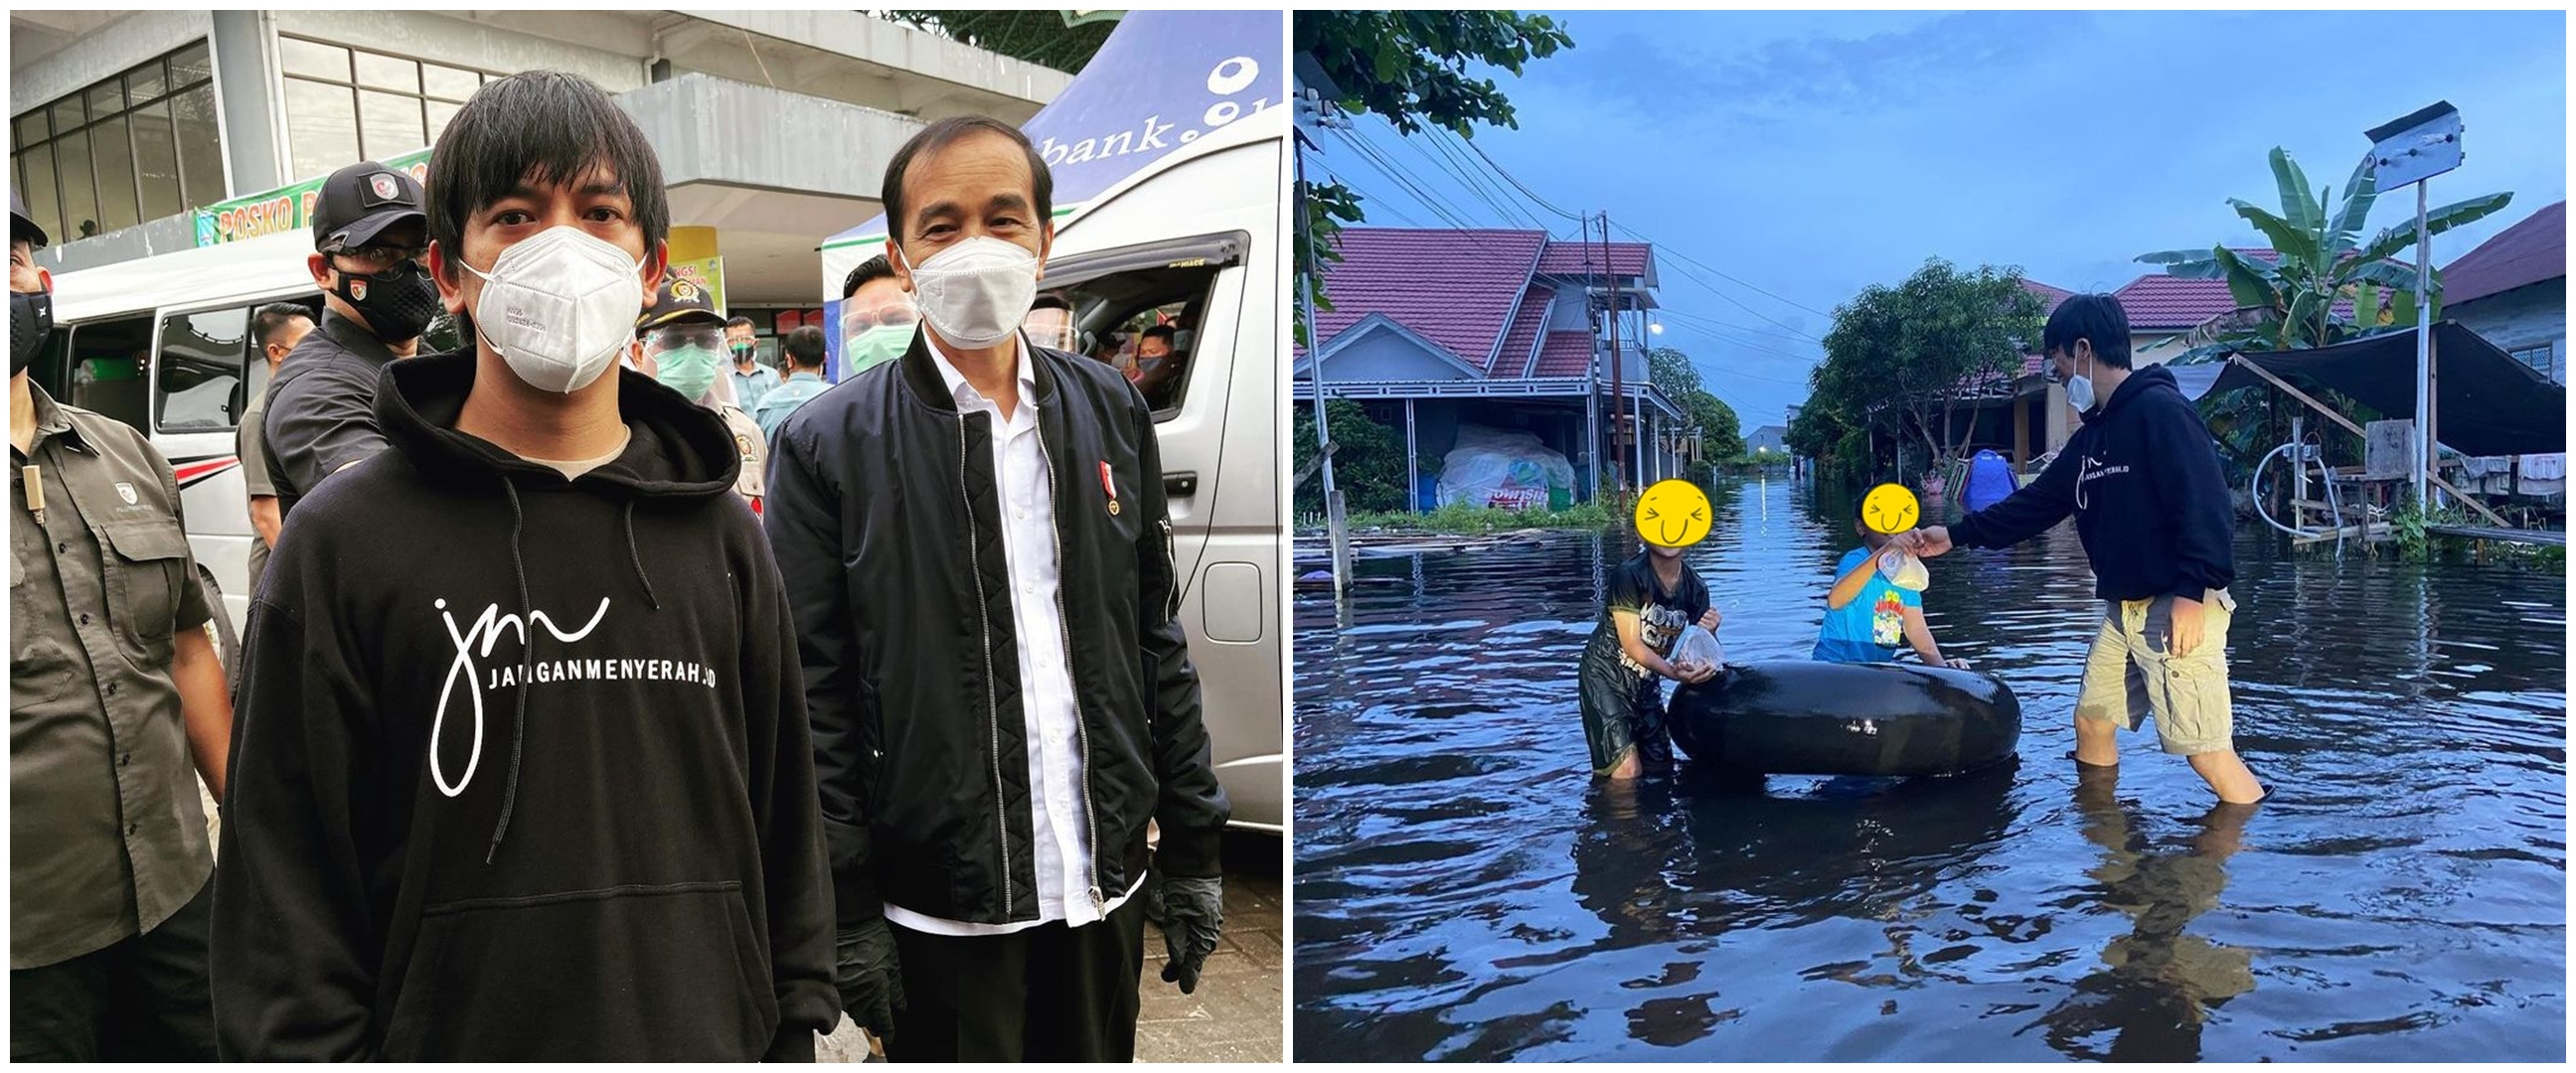 7 Aksi Rian D'Masiv bantu korban banjir di Kalsel, tuai pujian